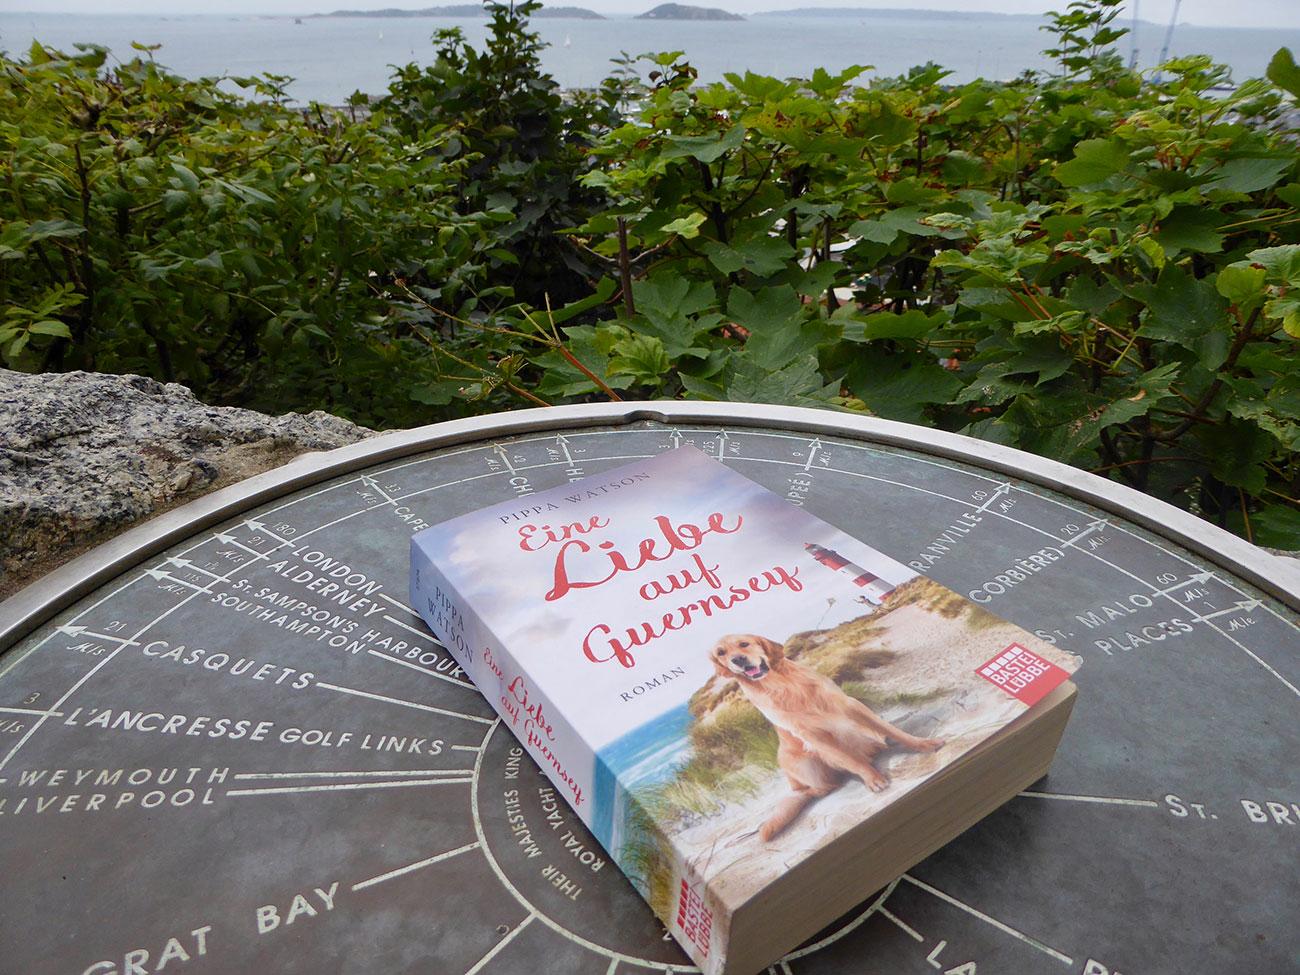 'Eine Liebe auf Guernsey' - sun, sea, sand and romance on the holiday island of Guernsey